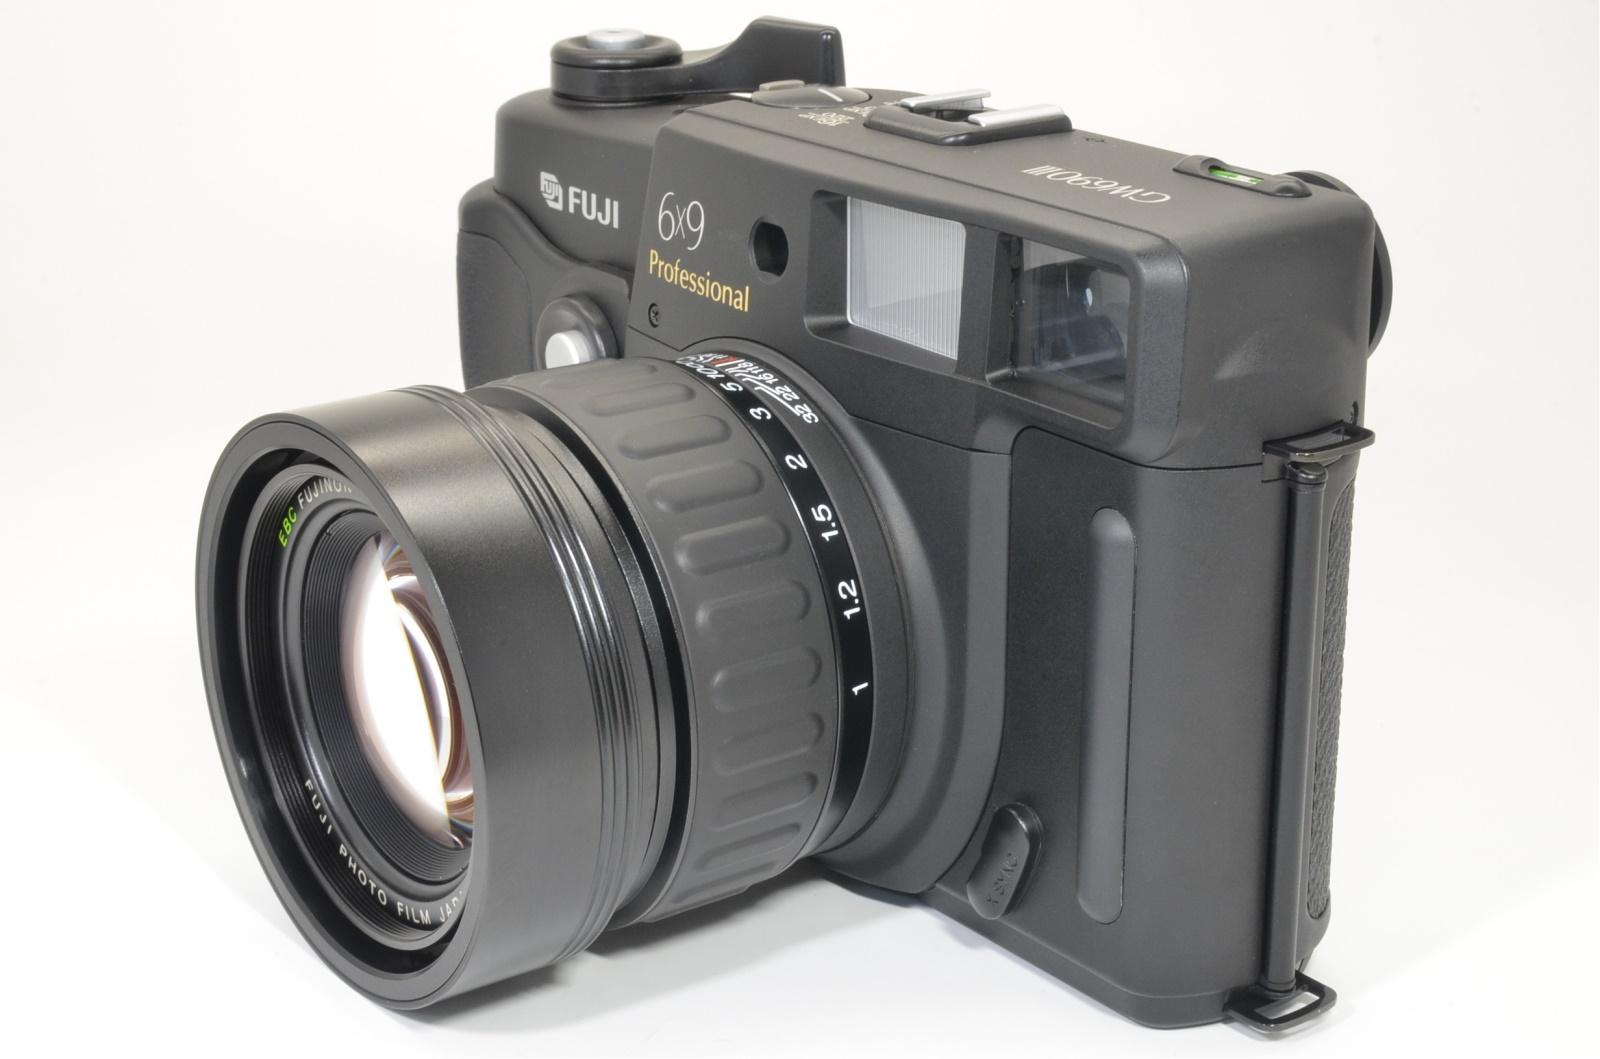 fuji fujifilm gw690iii 90mm f3.5 count 171 medium format camera shooting tested